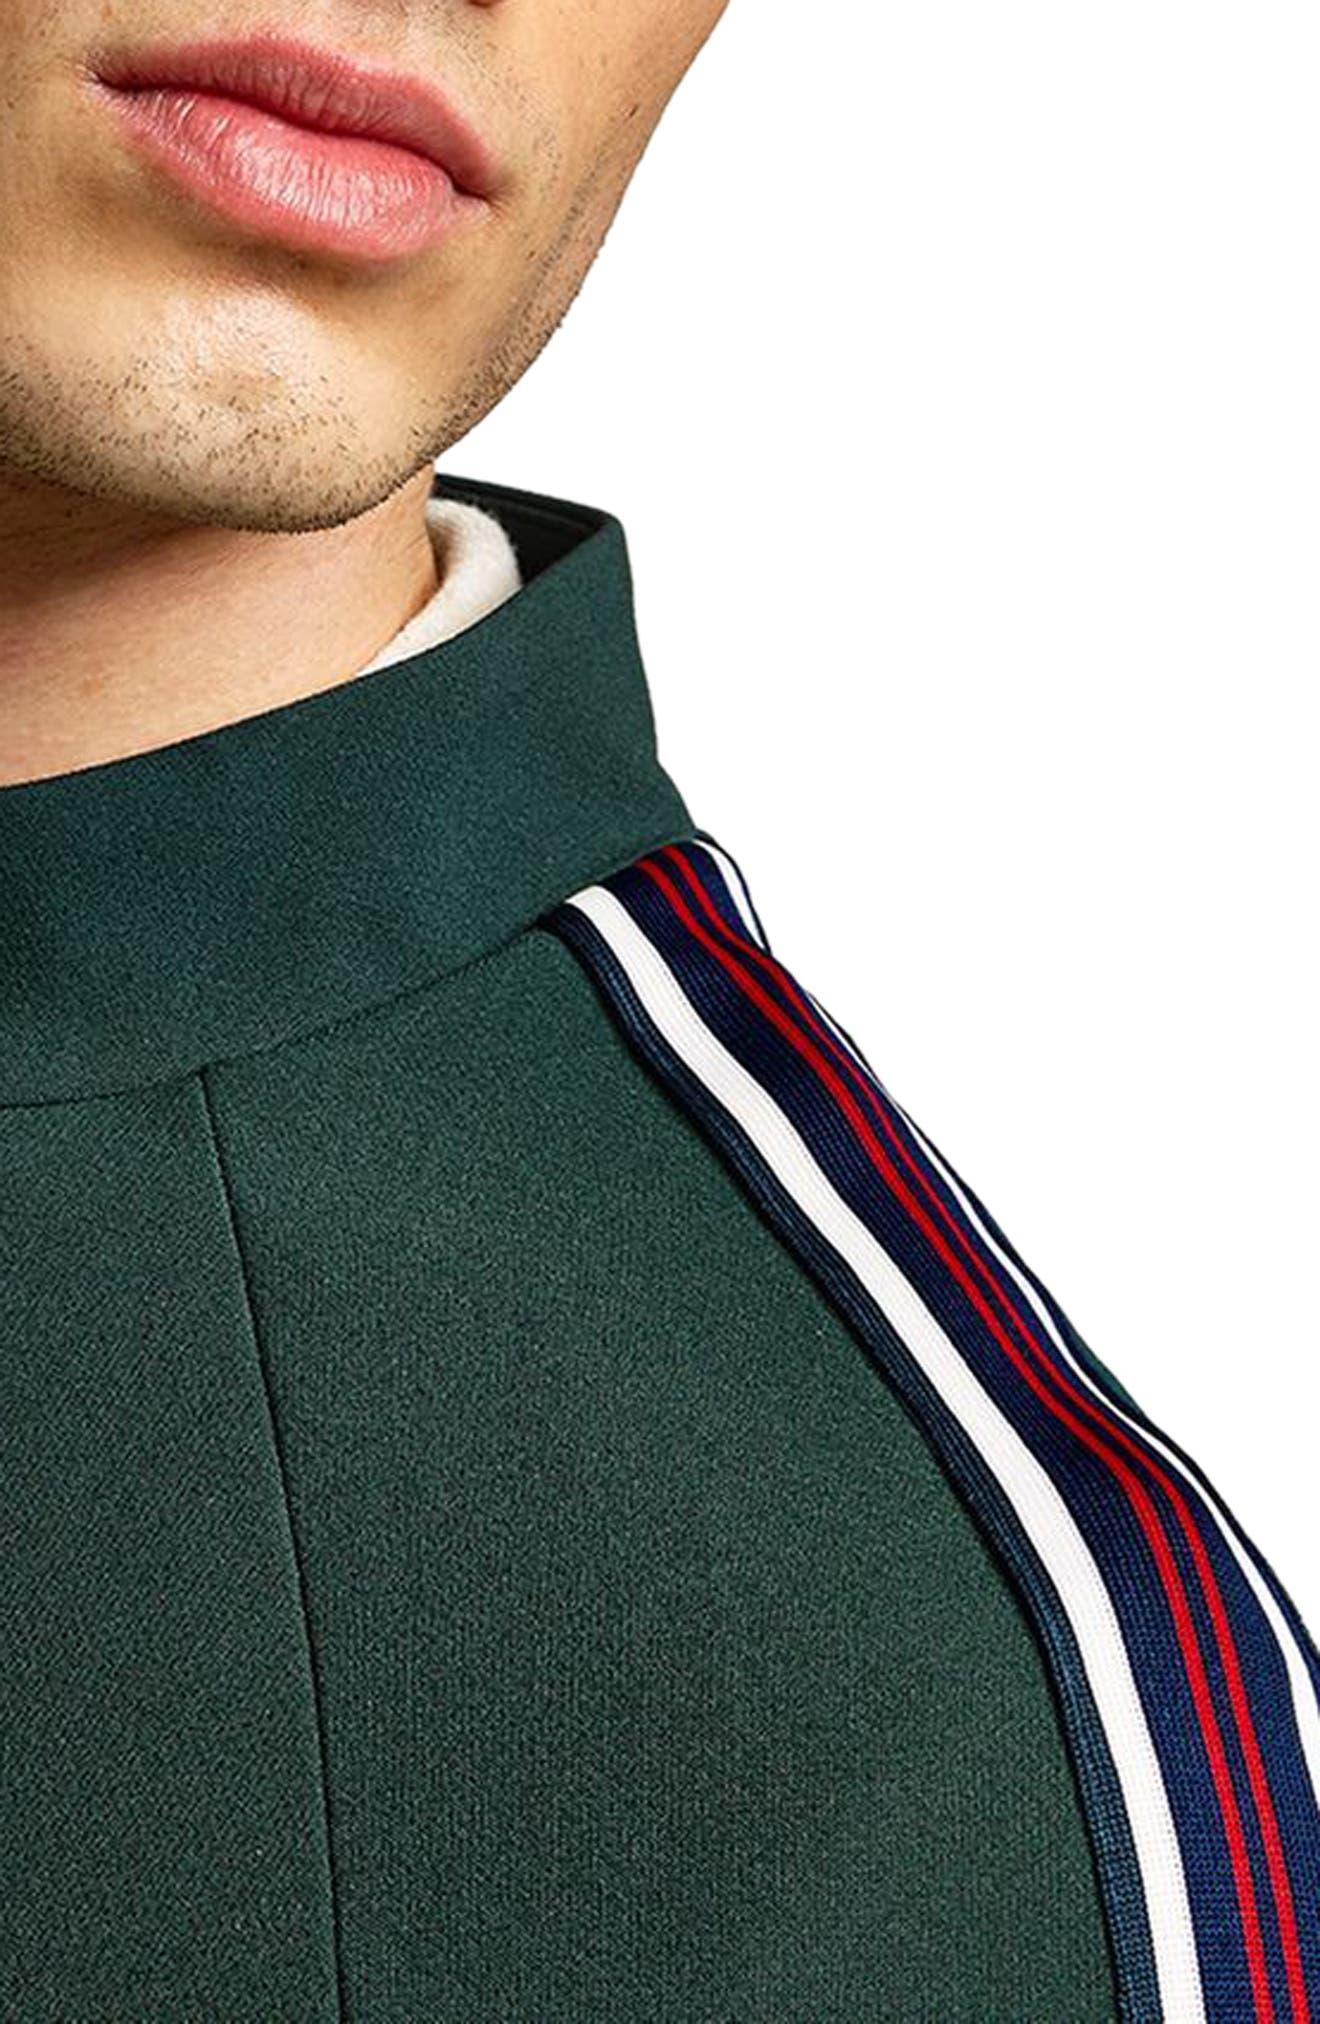 Track Jacket,                             Alternate thumbnail 3, color,                             GREEN MULTI